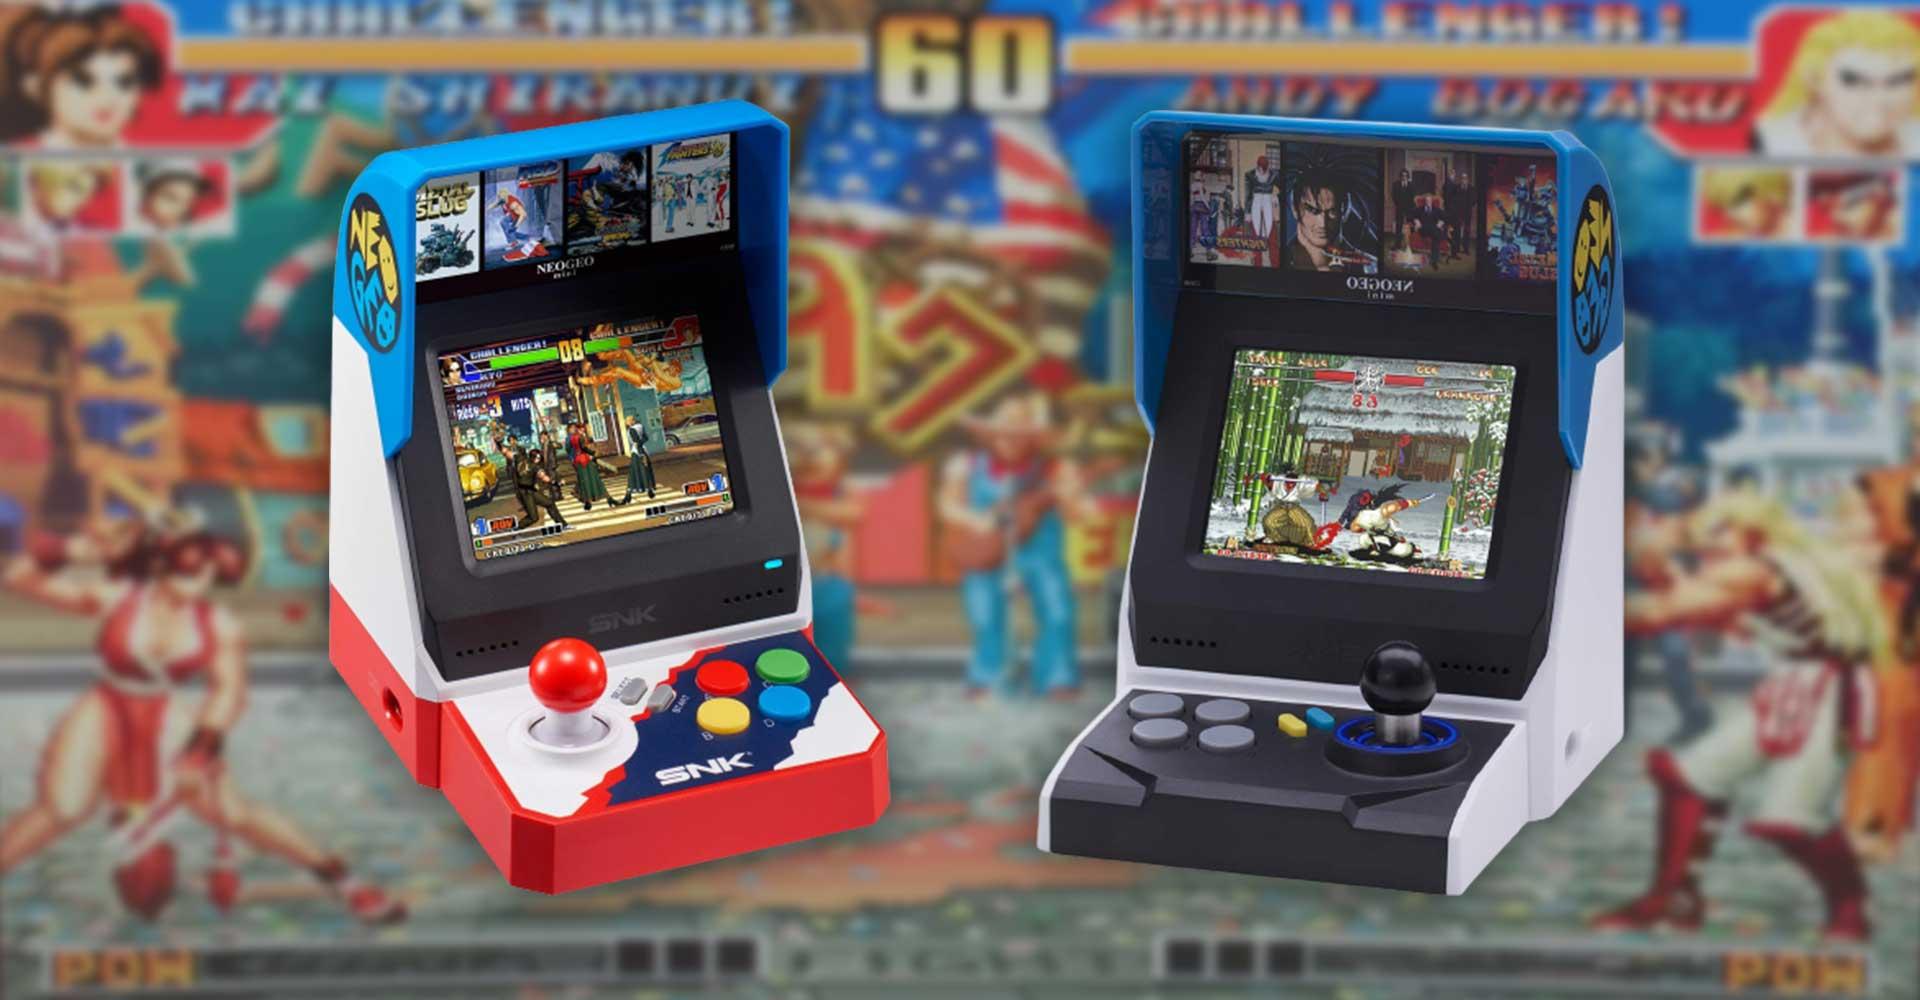 Retro- und Minikonsolen #6 Neo Geo Mini: Mini-Arcade-Automat mit Problemen